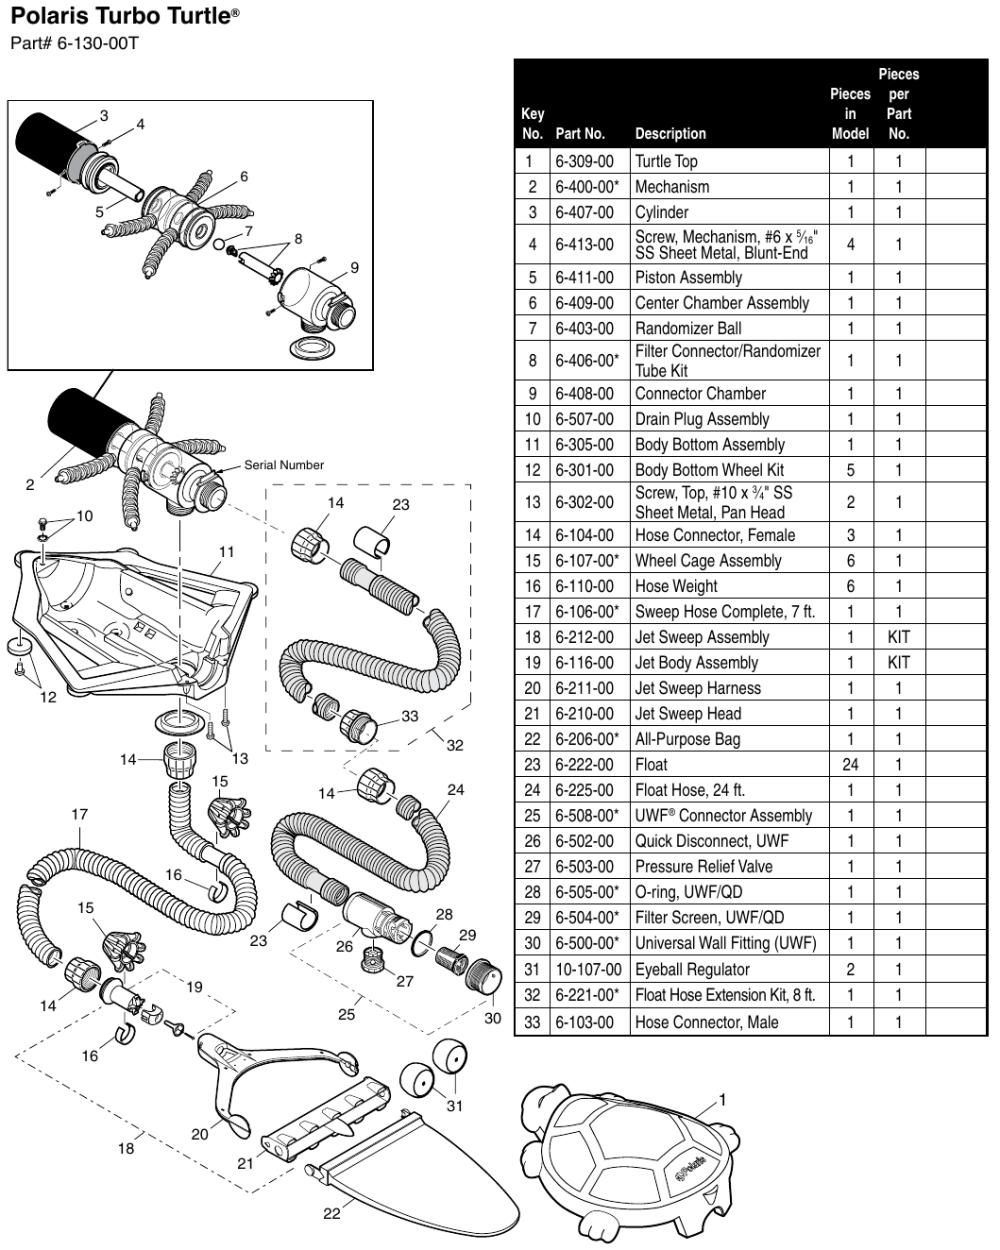 medium resolution of polaris turbo turtle parts